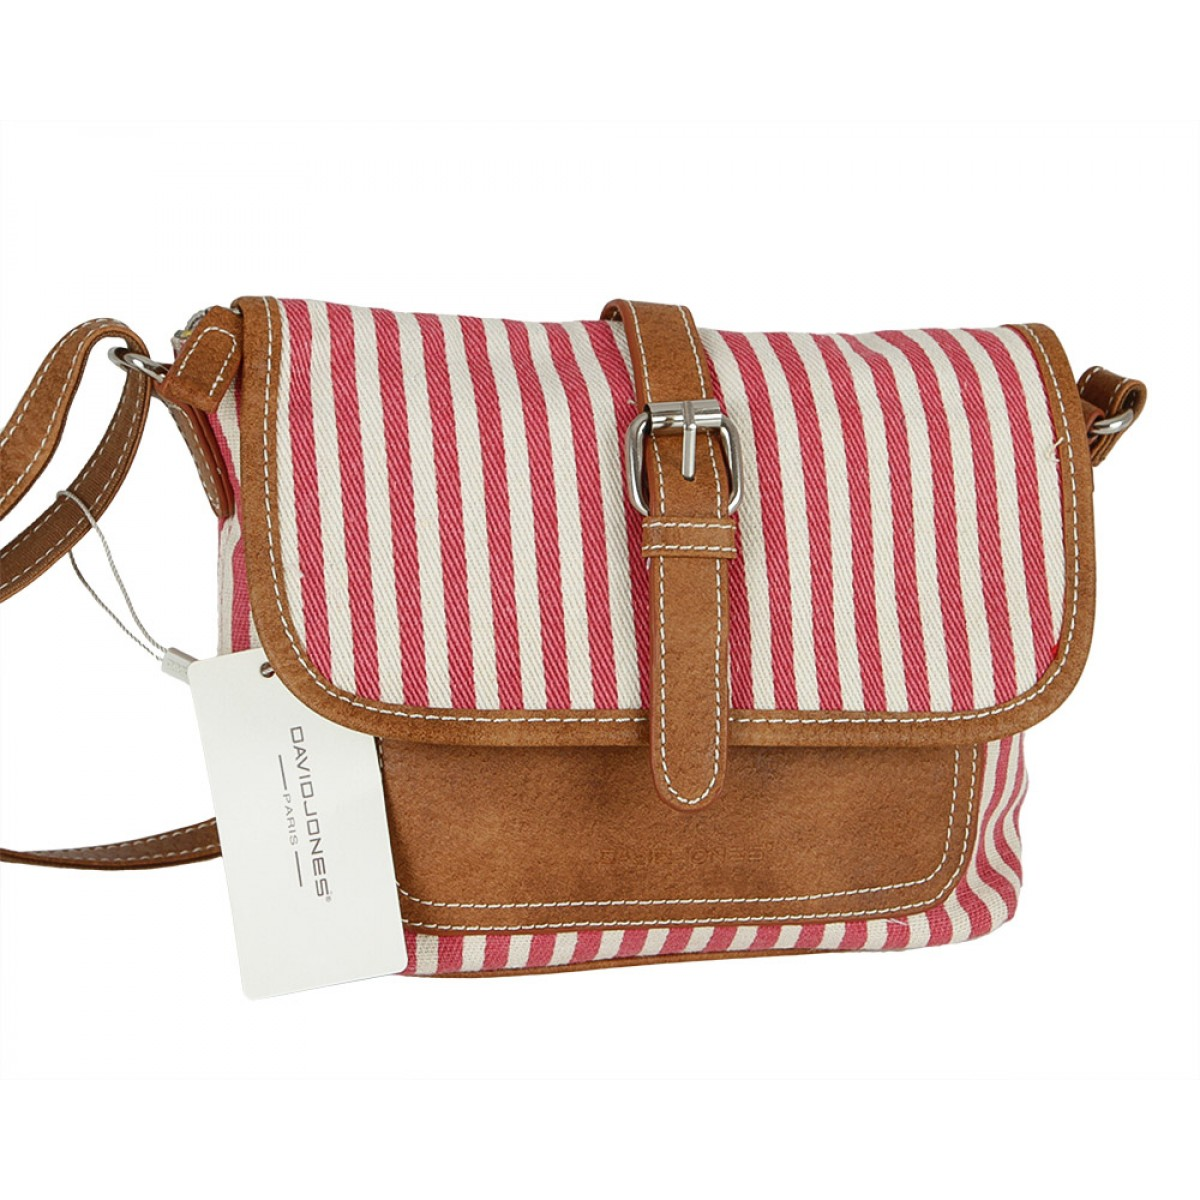 Жіноча сумка David Jones 5961-1 ROSE/RED